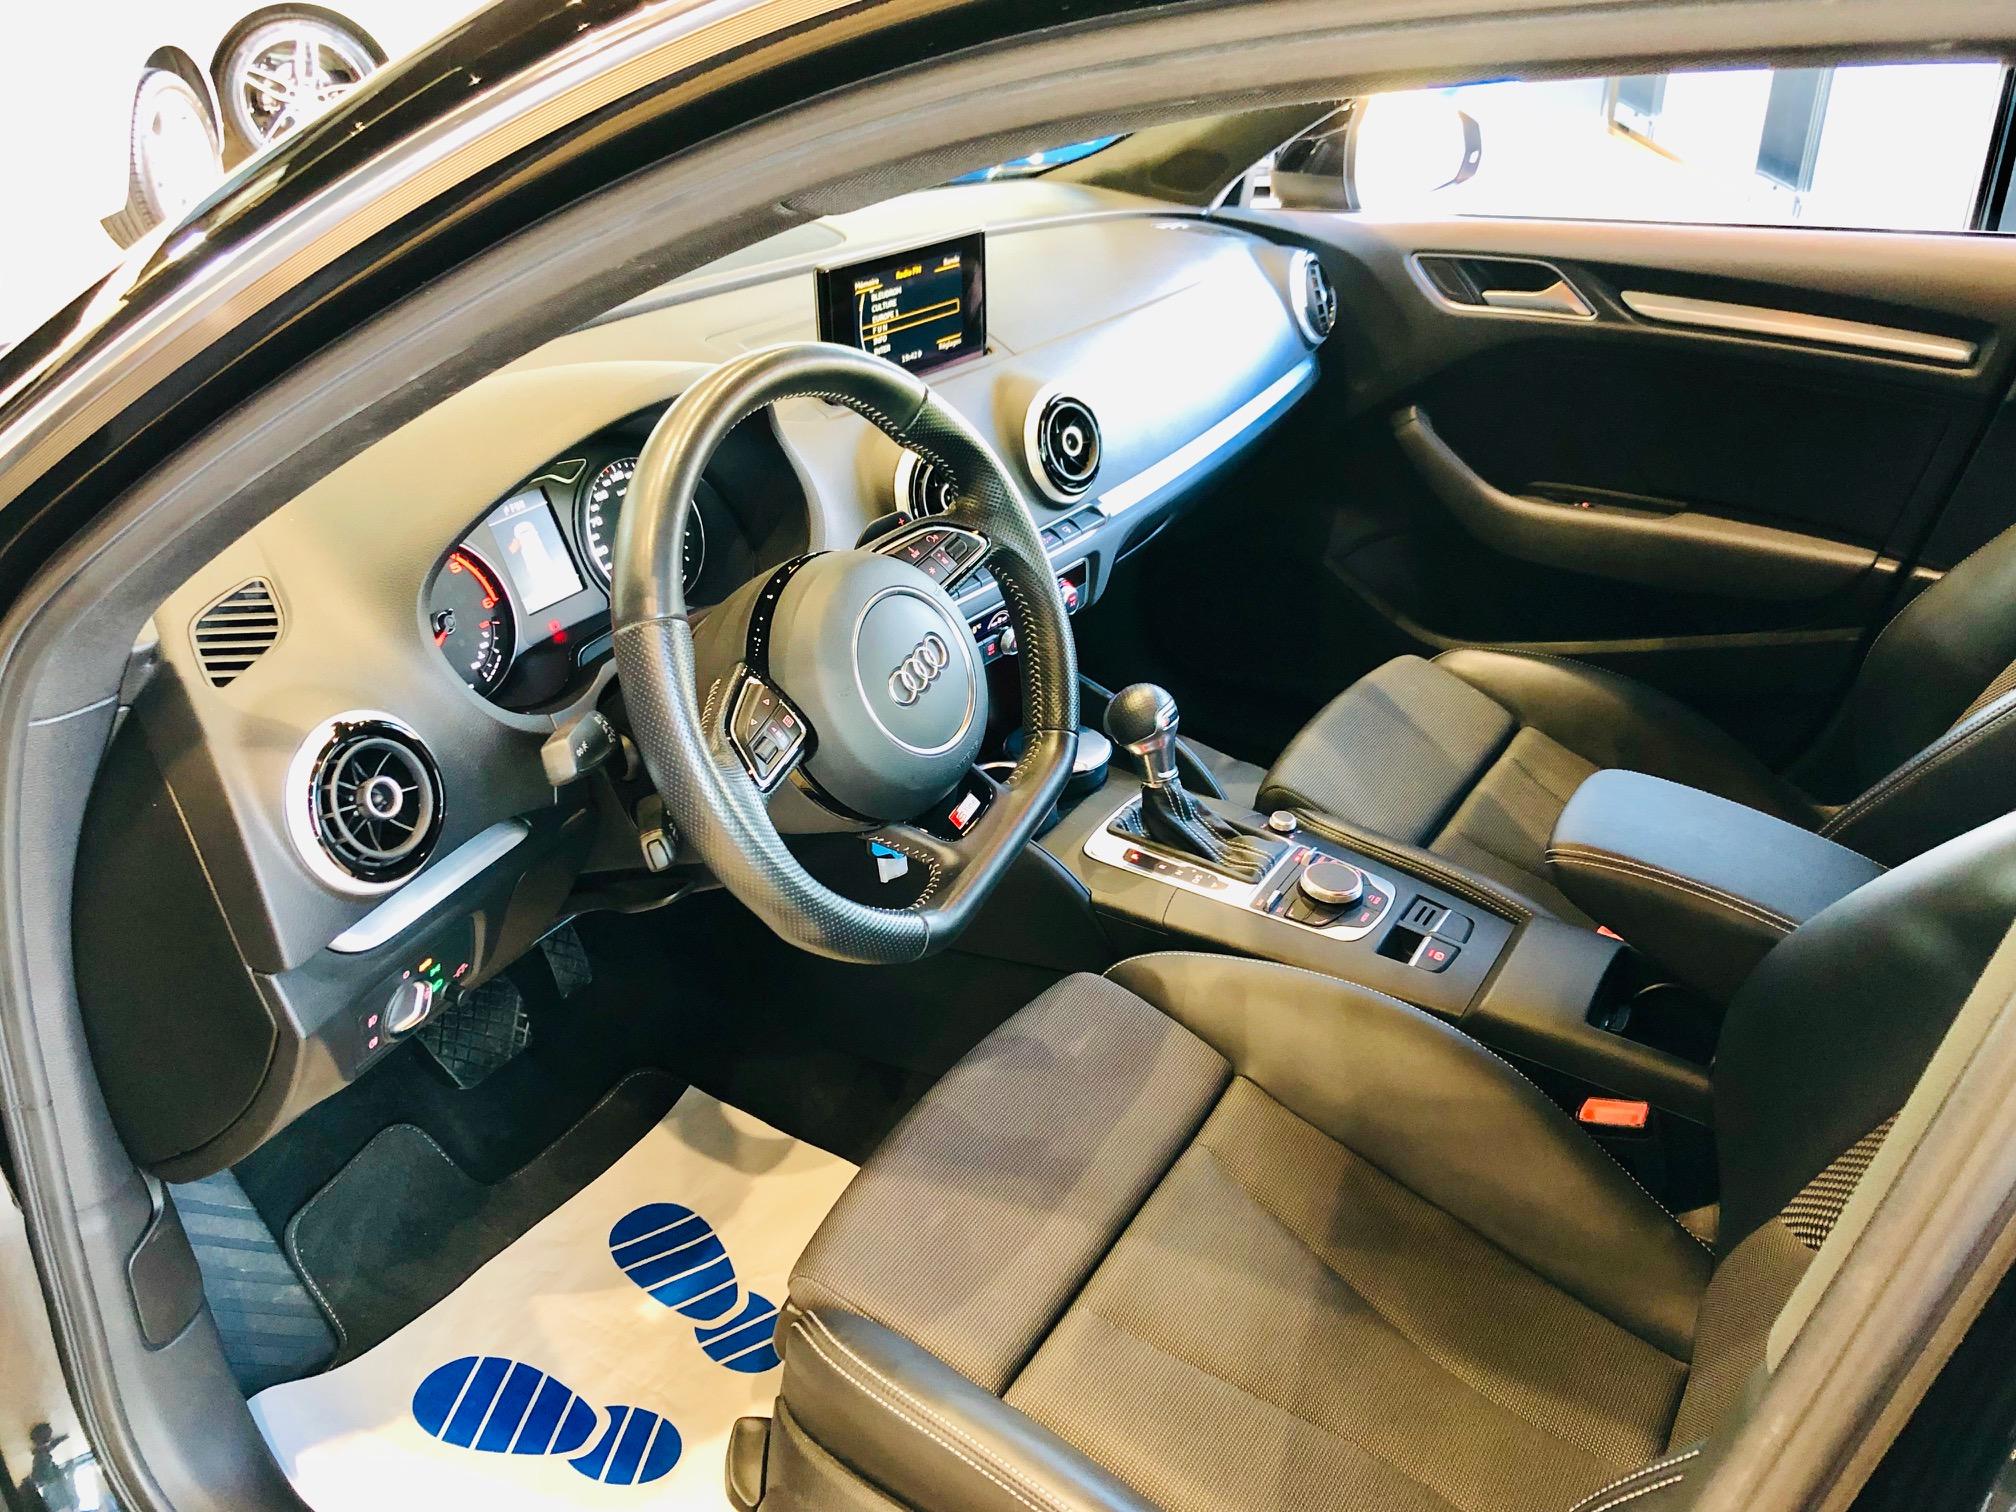 Occasion Audi A3 2.0 TDI 150cv Sportback Sline Face Avant Gauche